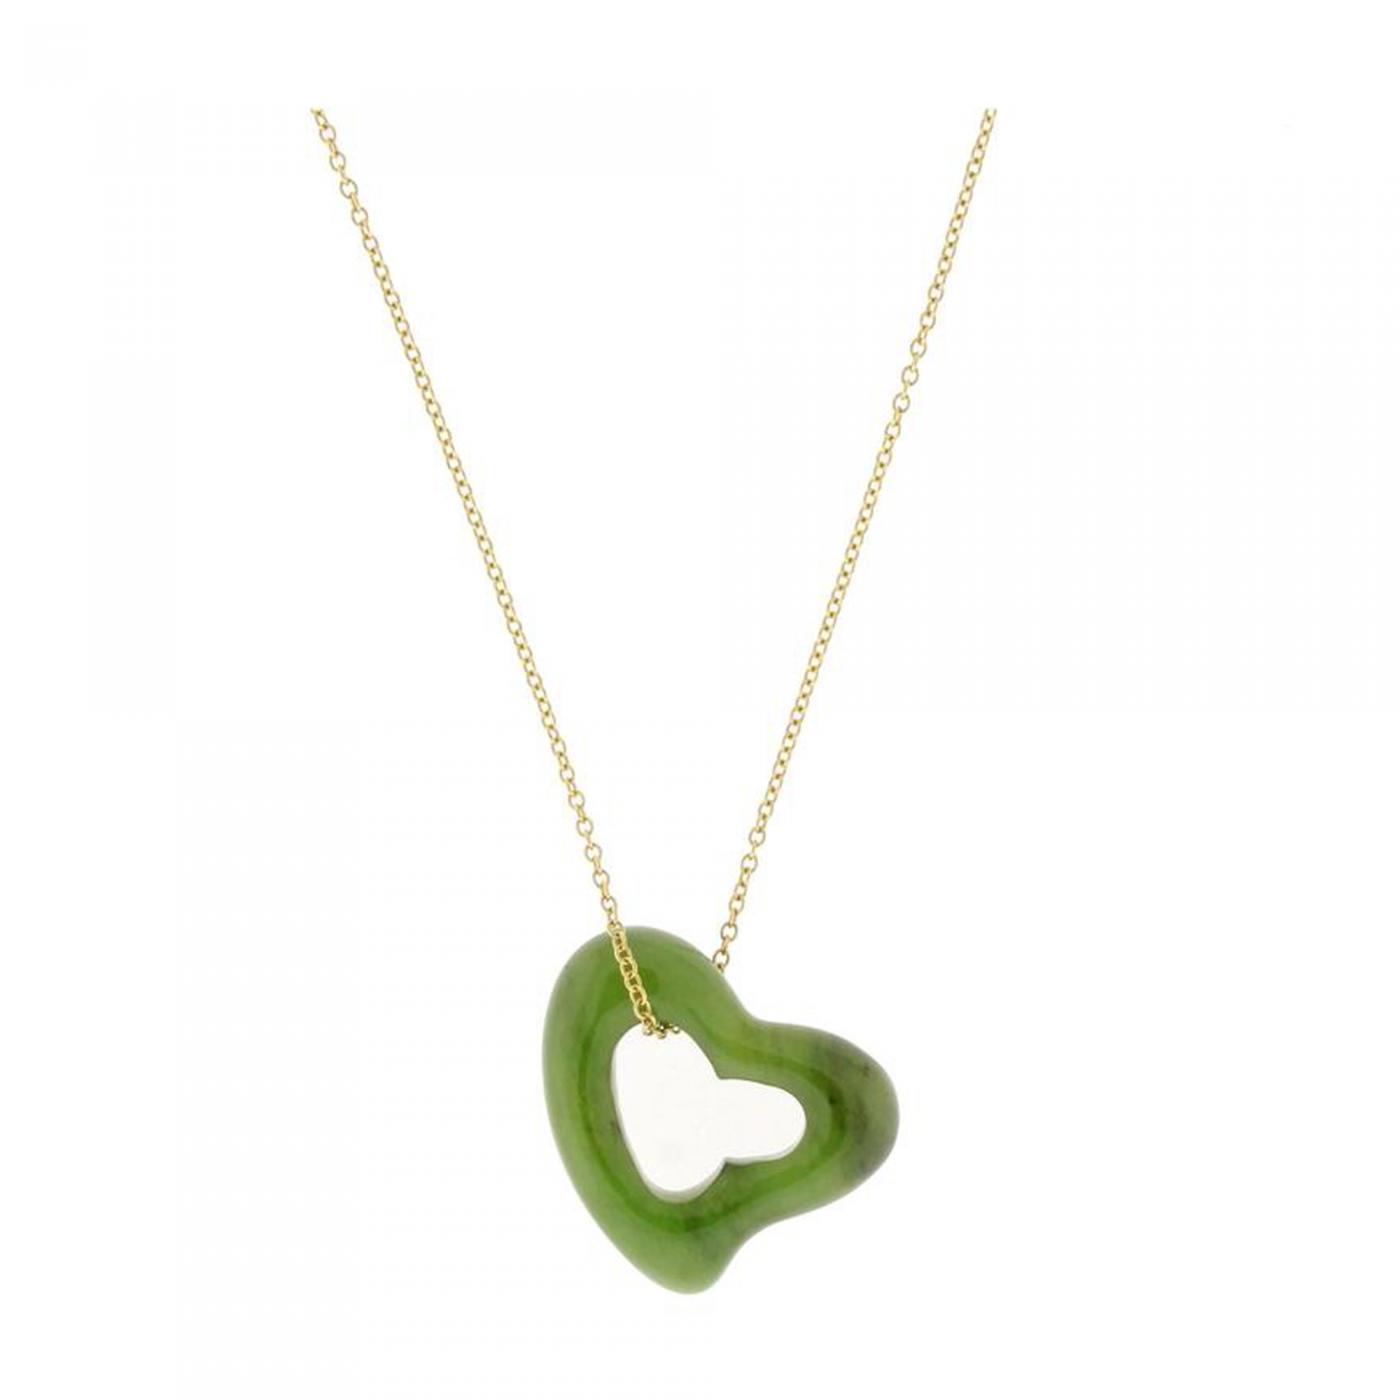 b6ccbfe5f4edf Elsa Peretti - Tiffany & Co. Elsa Peretti Large Jade Open Heart Necklace